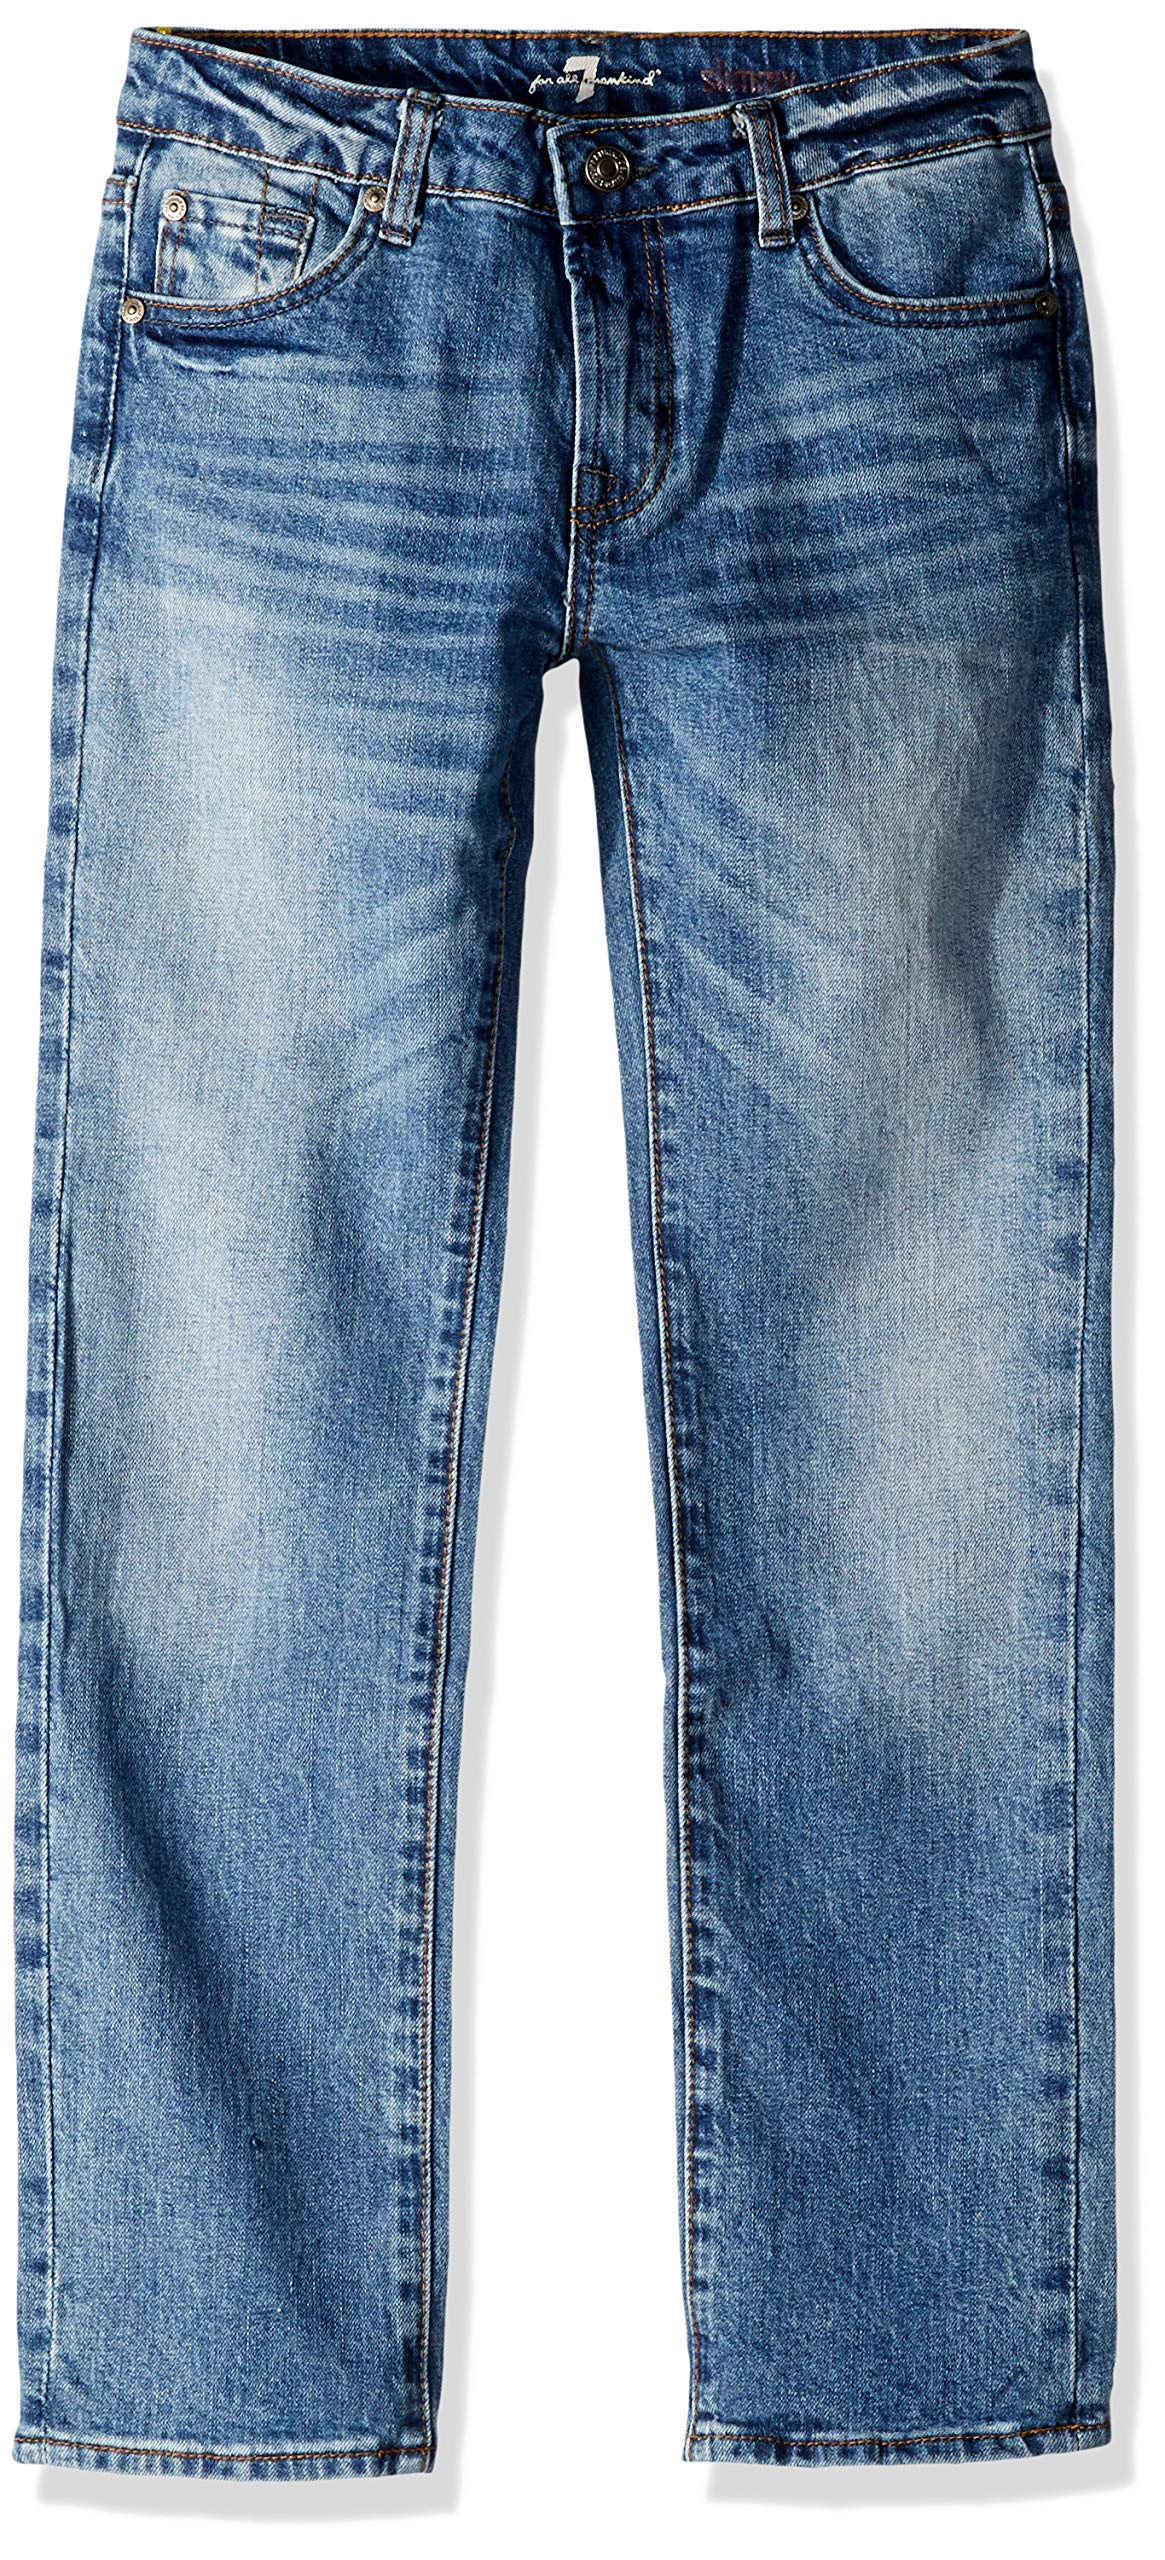 7 For All Mankind Kids Boys' Big Slimmy Jean, Backhand, 10